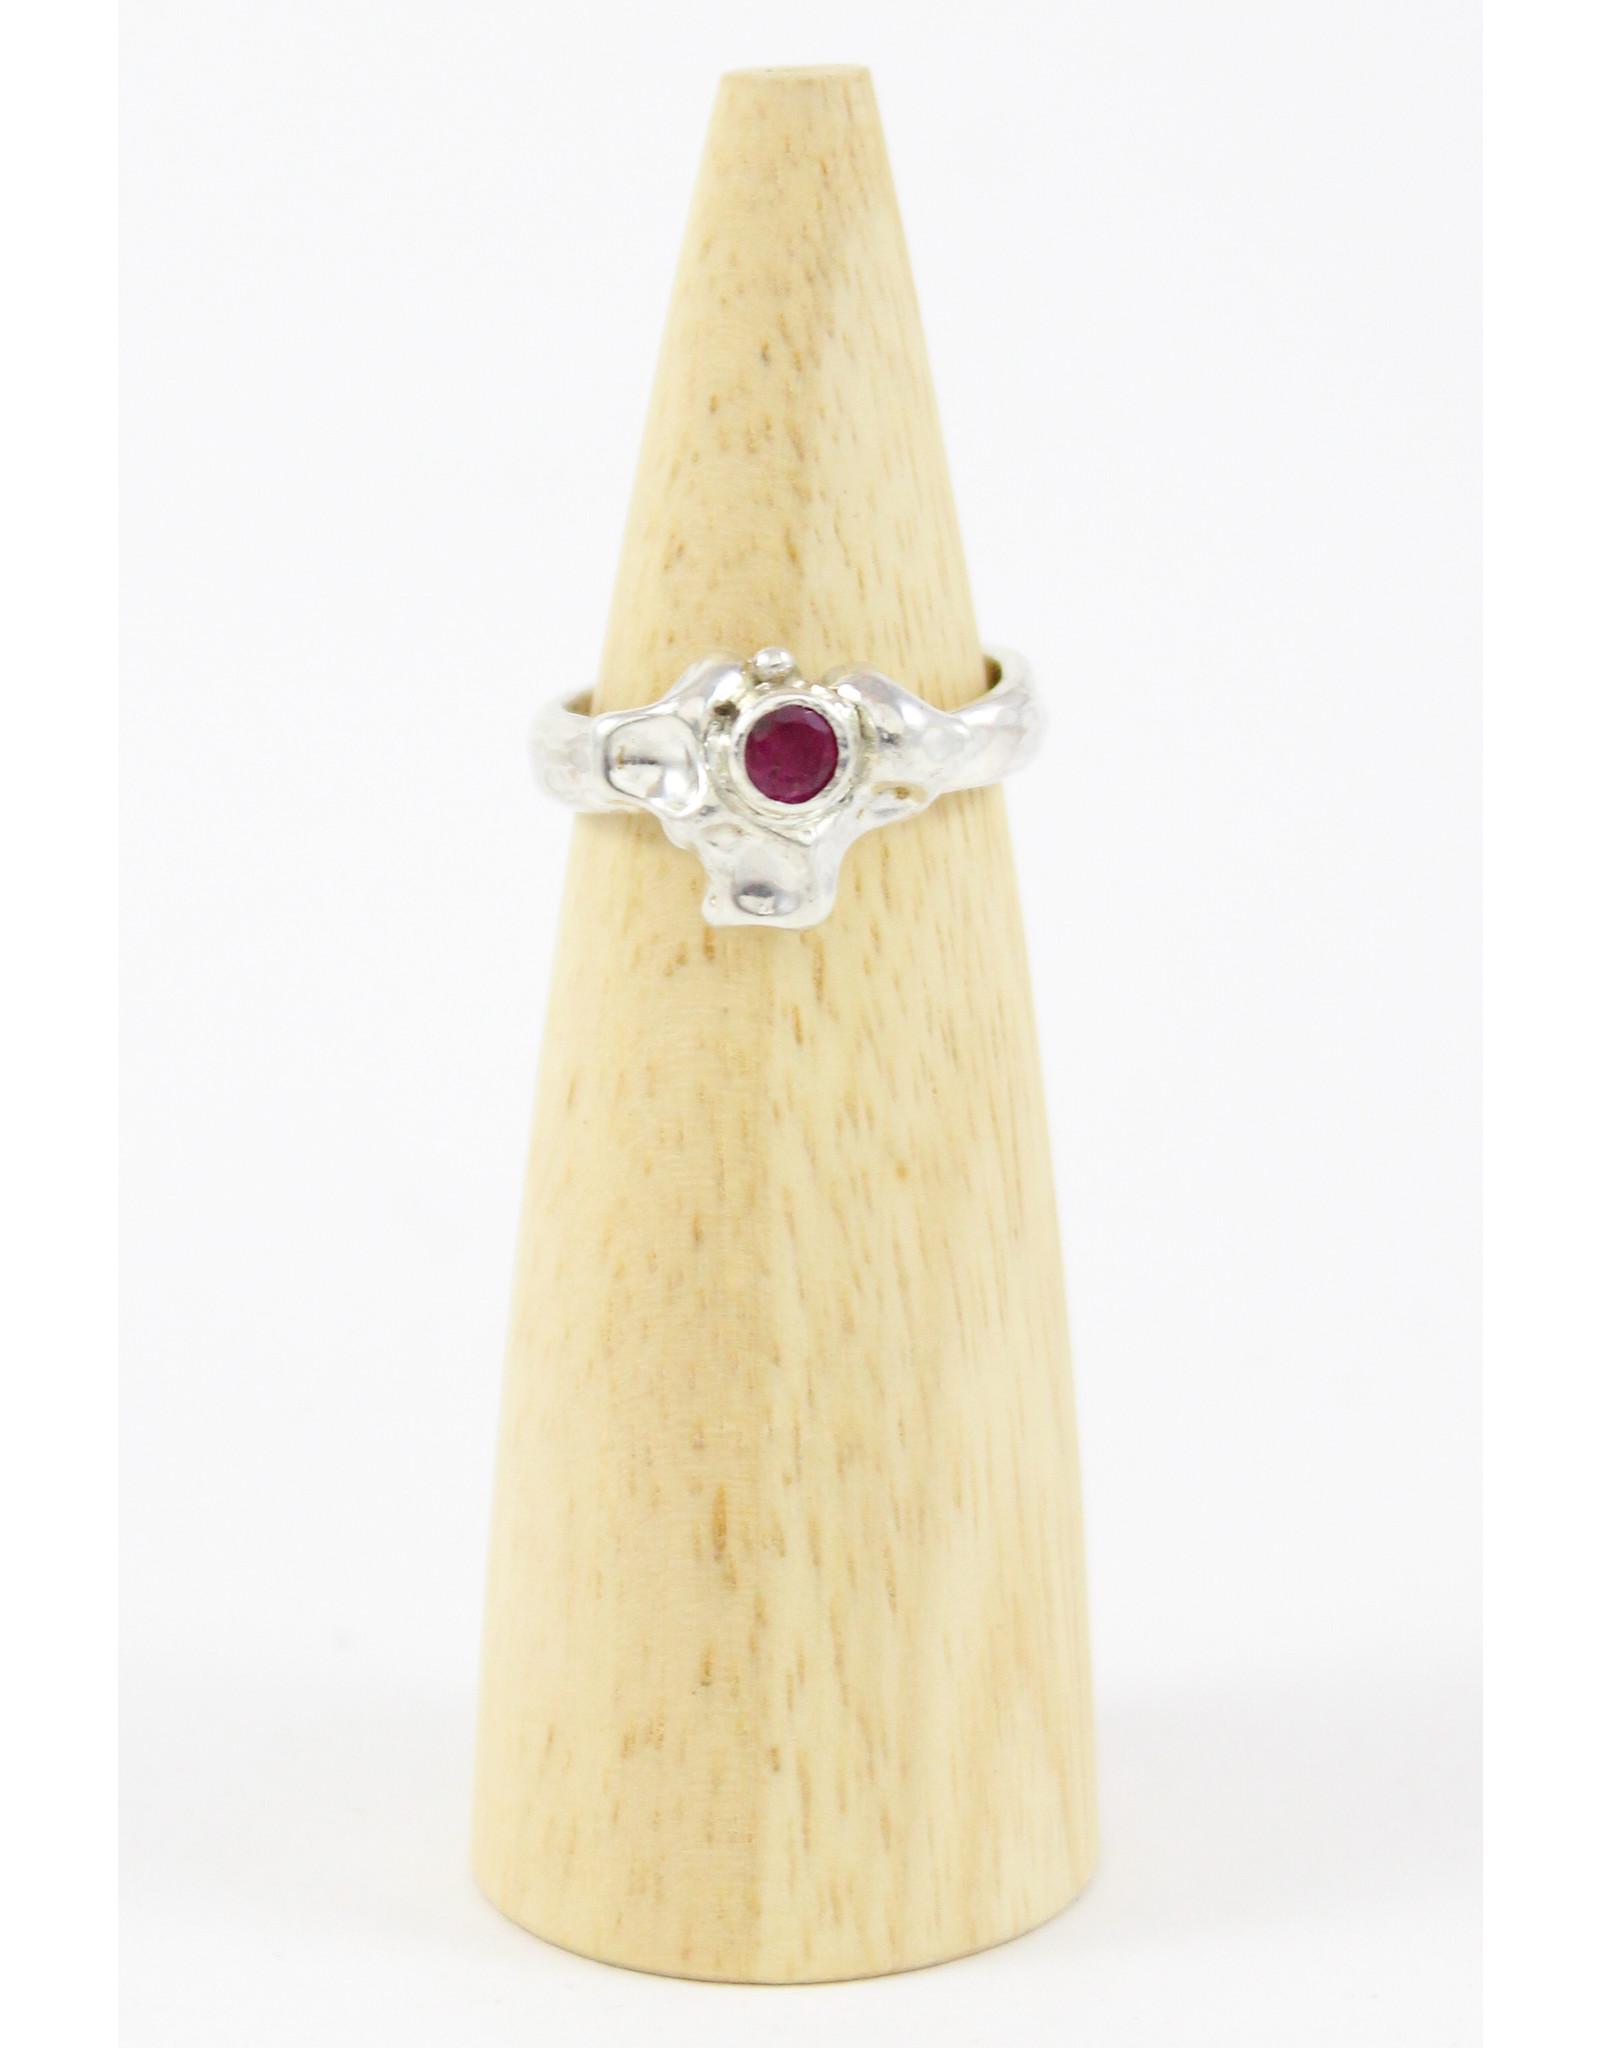 Teddy Tedford Pink Tourmaline Ring by Teddy Tedford